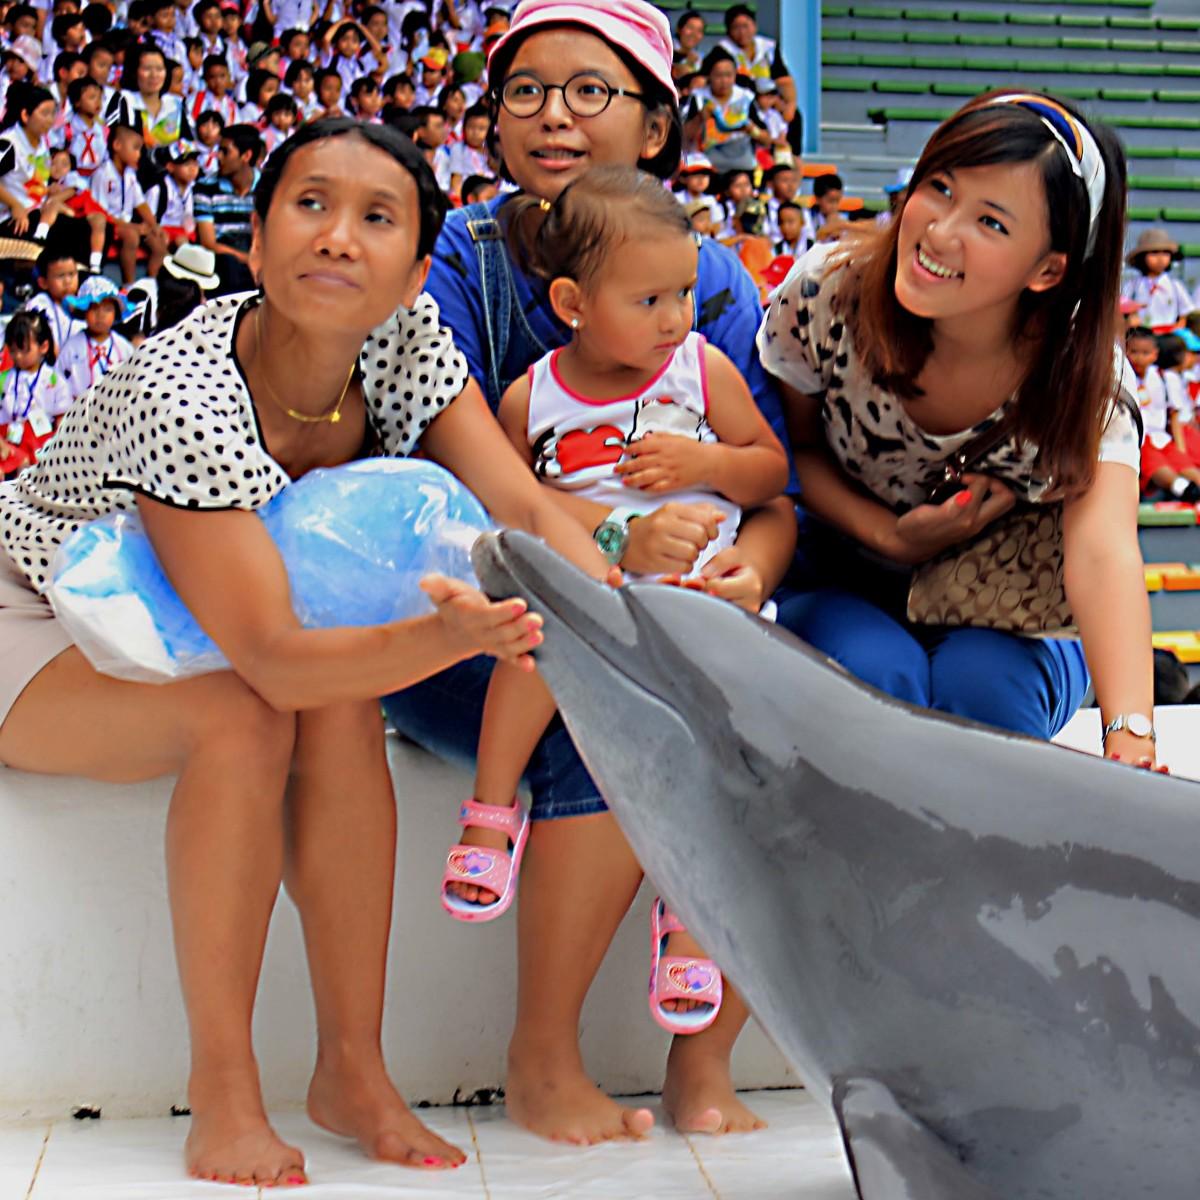 The Dolphinarium at Ocean World